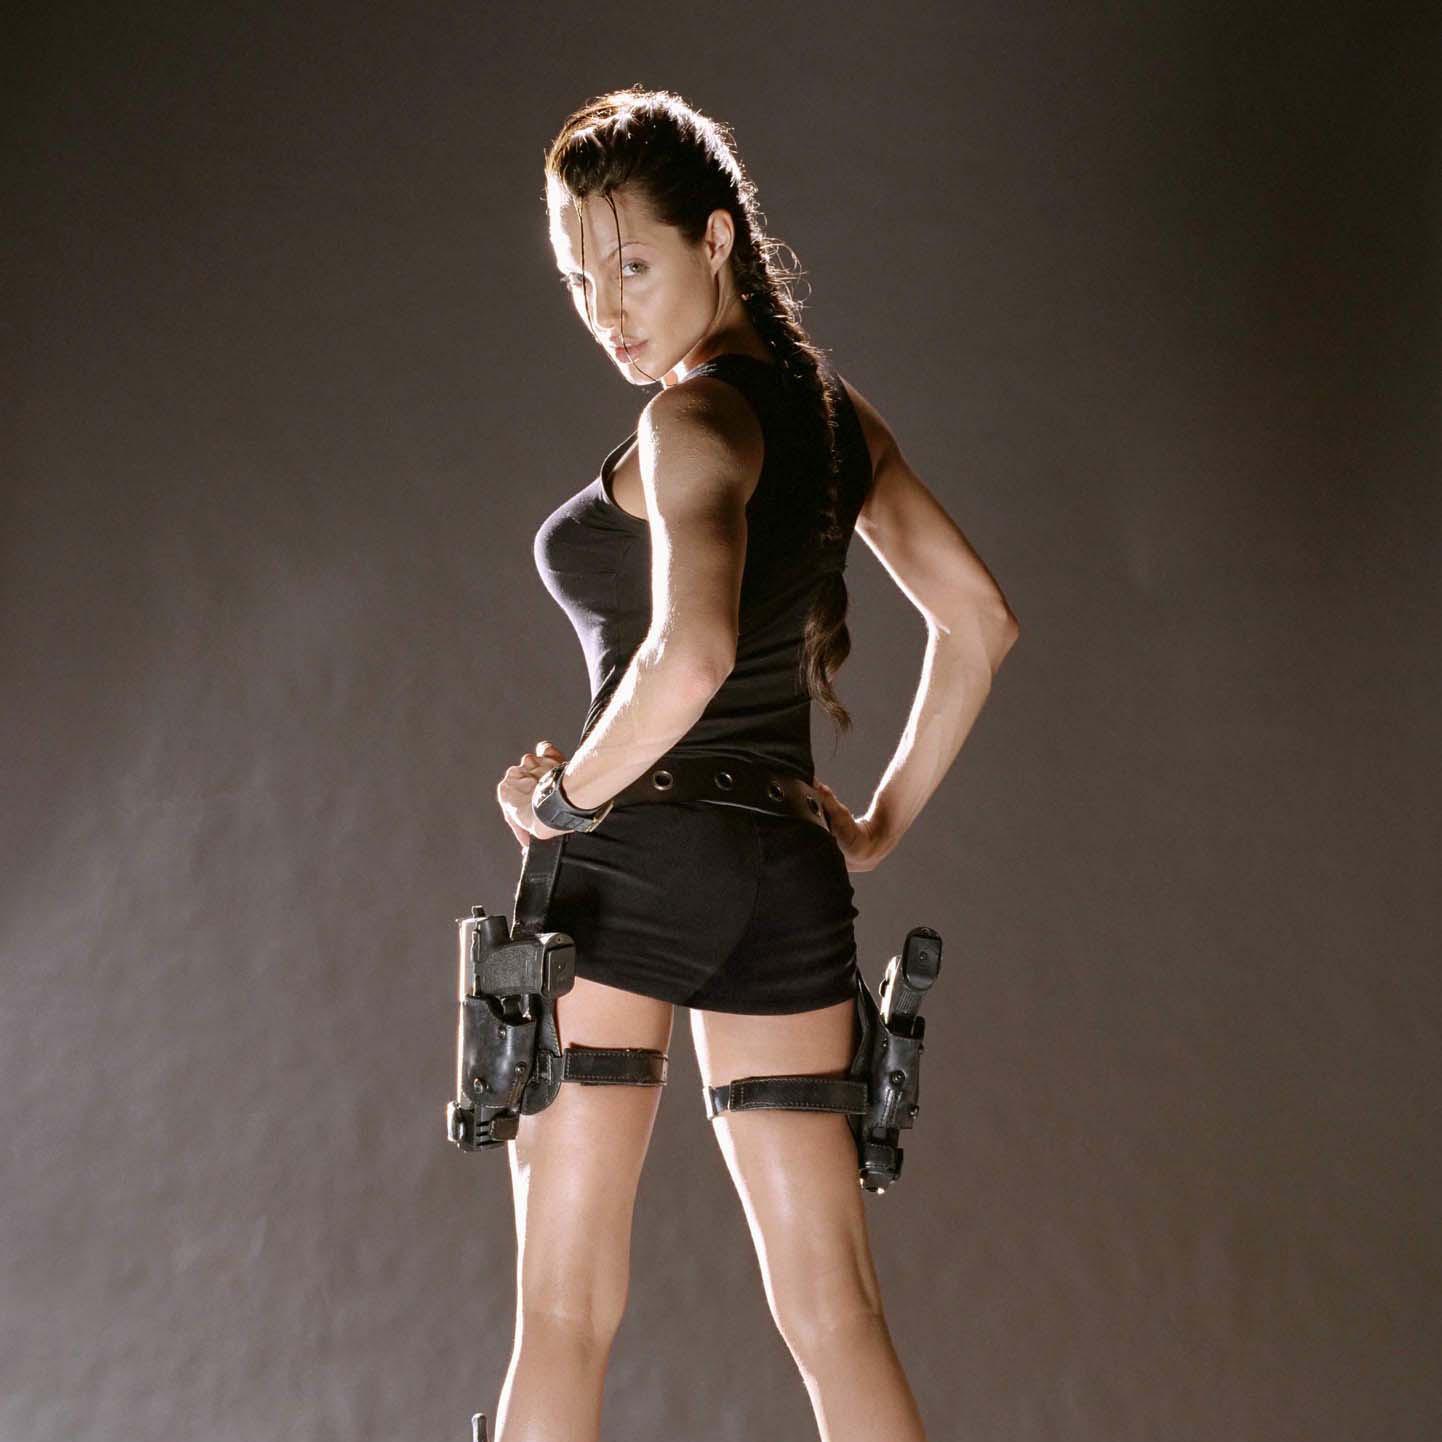 Hollywood Girls Gallery: Angeline Jolie - Tomb Raider